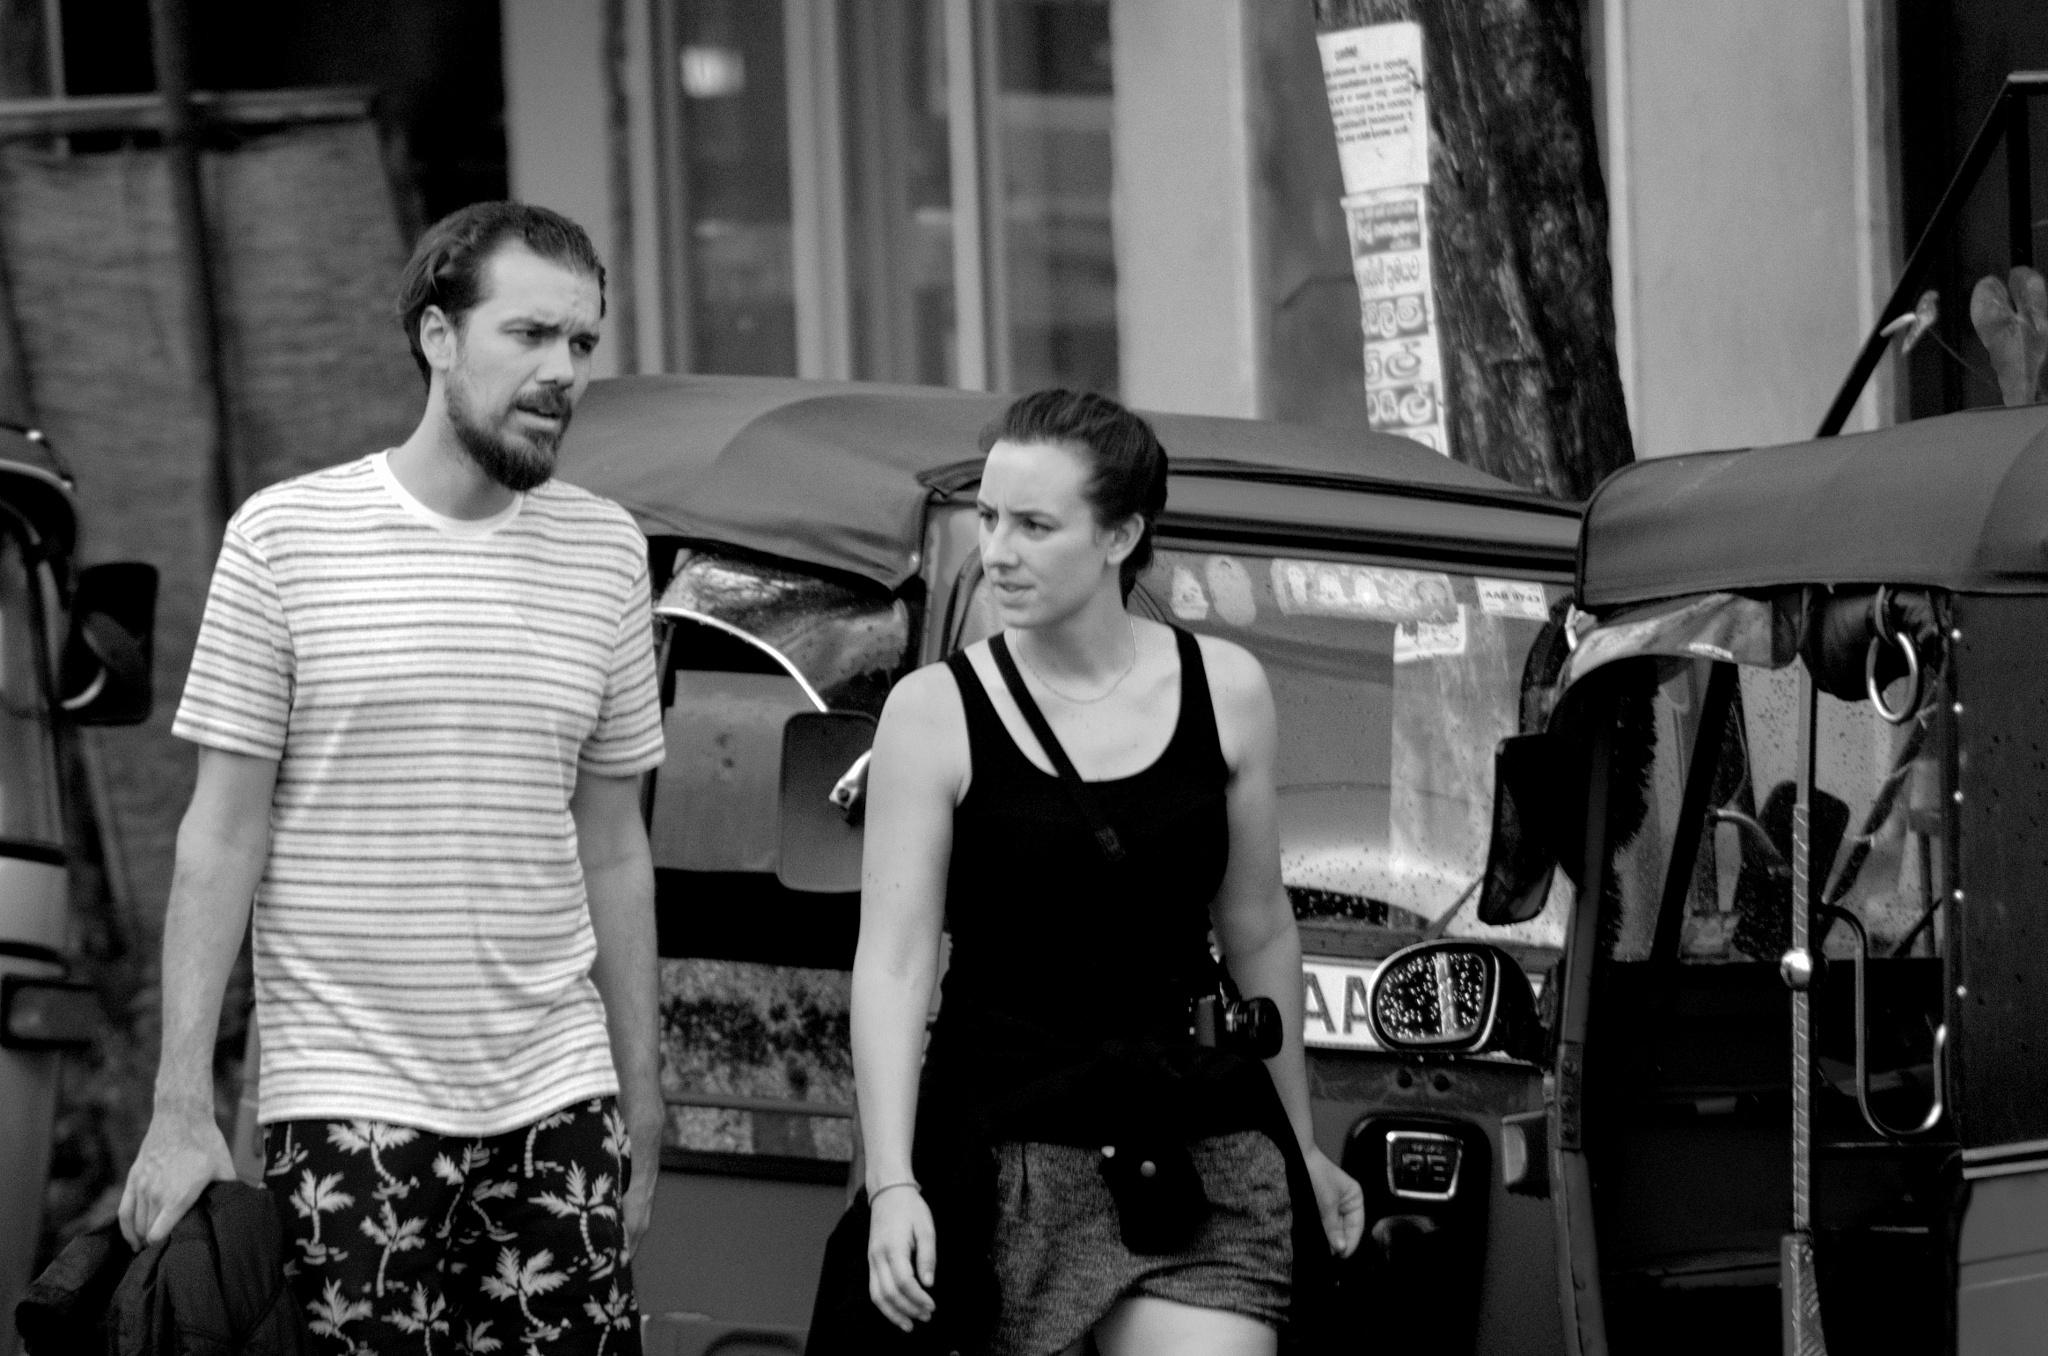 couple on the street of elle - nuwara eliya - srilanka by Saravanan Veeru